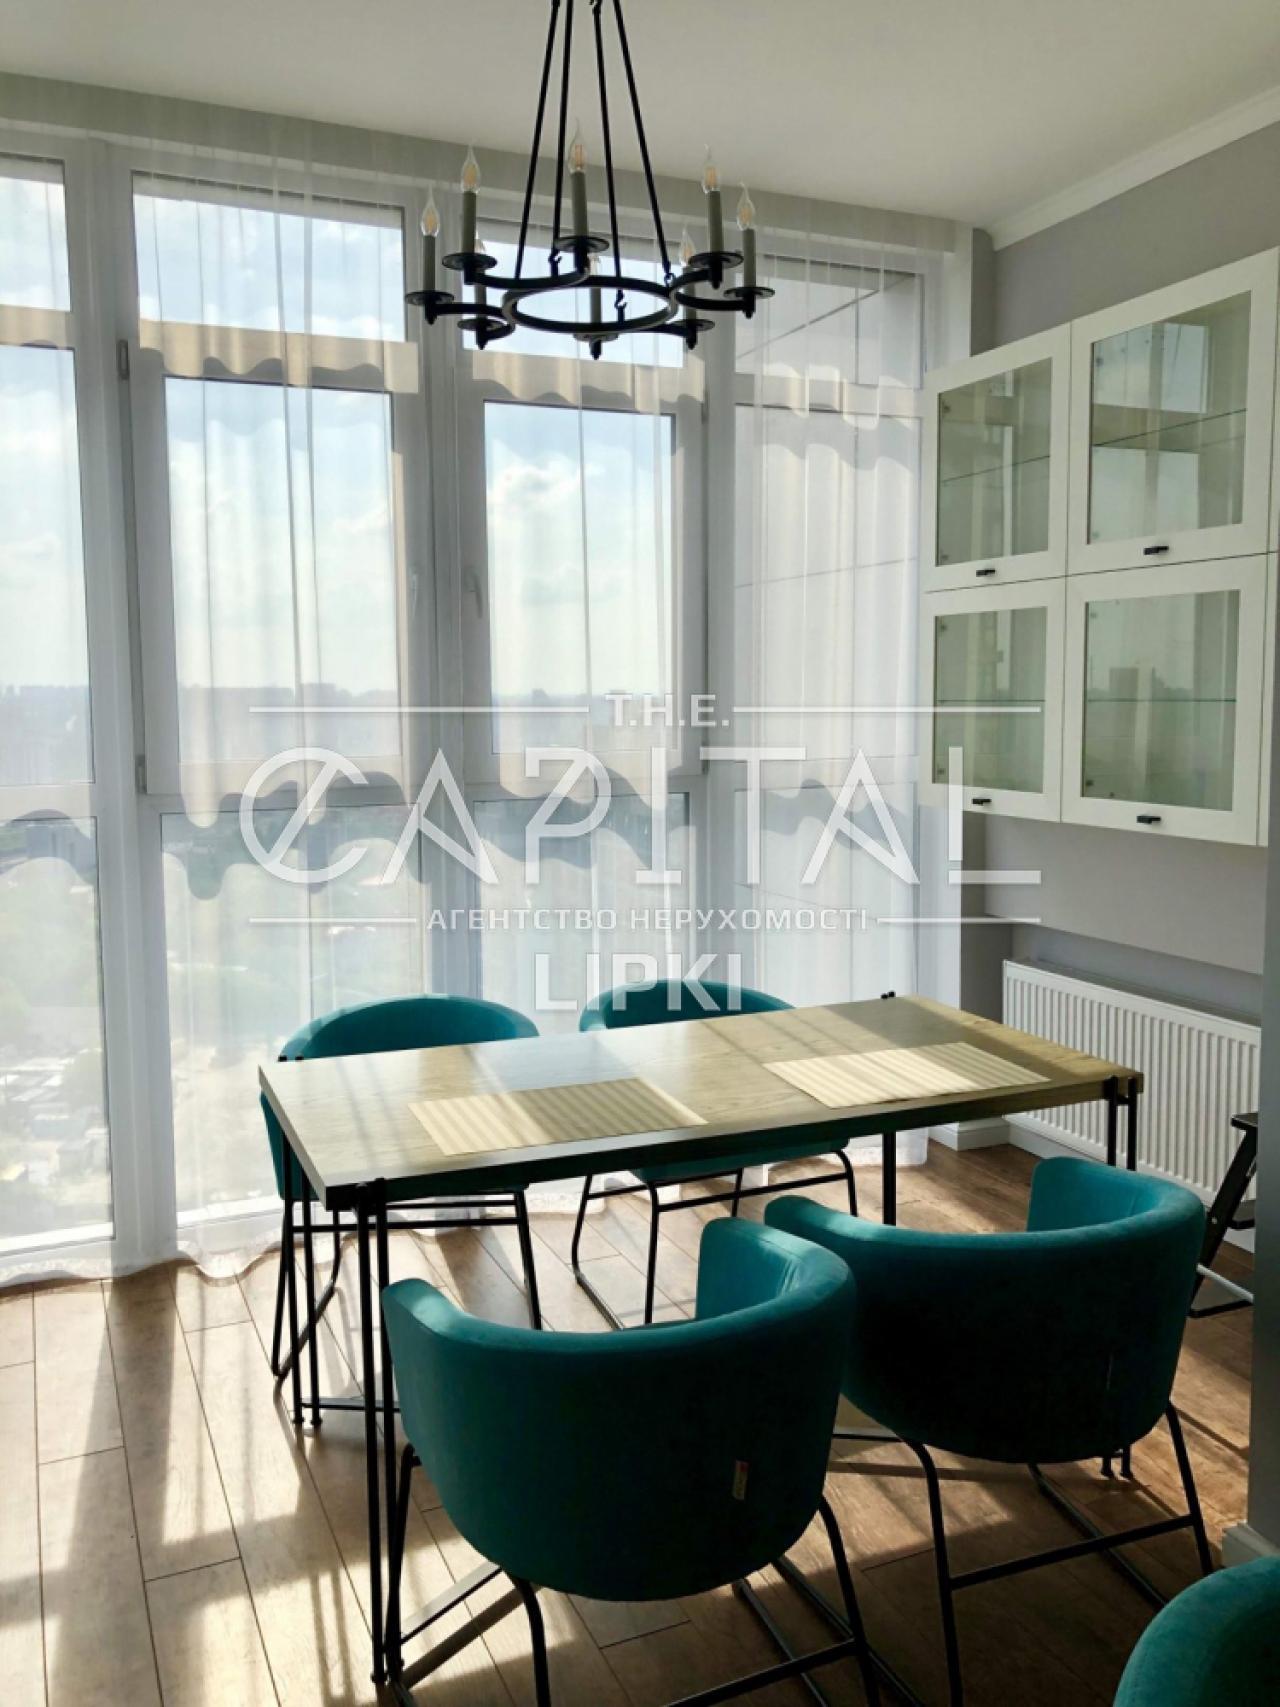 Аренда 3 комн. квартиры Михаила Драгомирова 11 за 1500 USD